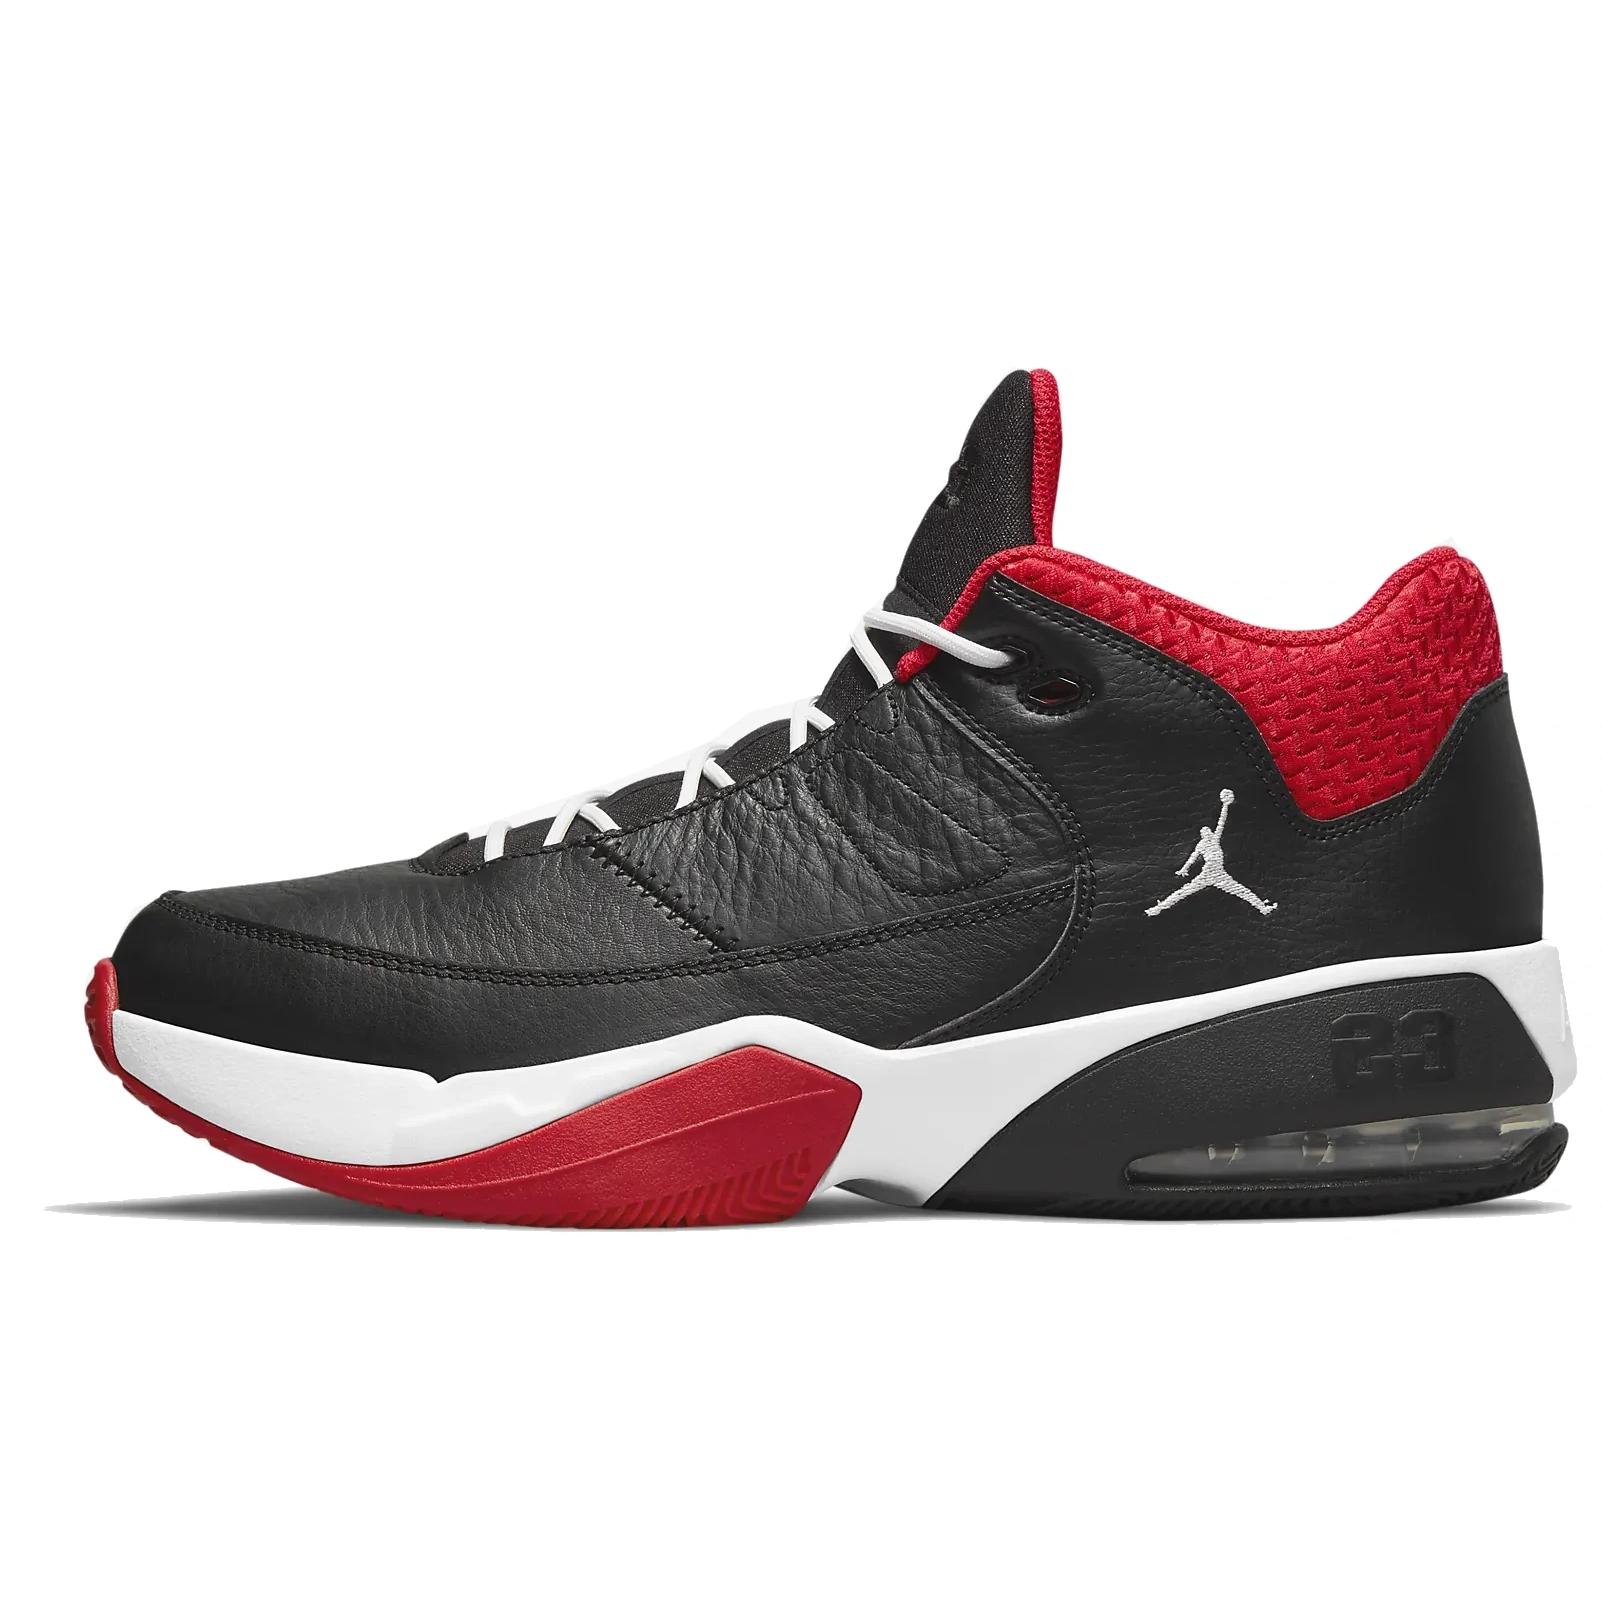 Foto de Nike Jordan Max Aura 3 Zapatillas para Hombre - black/white-university red CZ4167-006